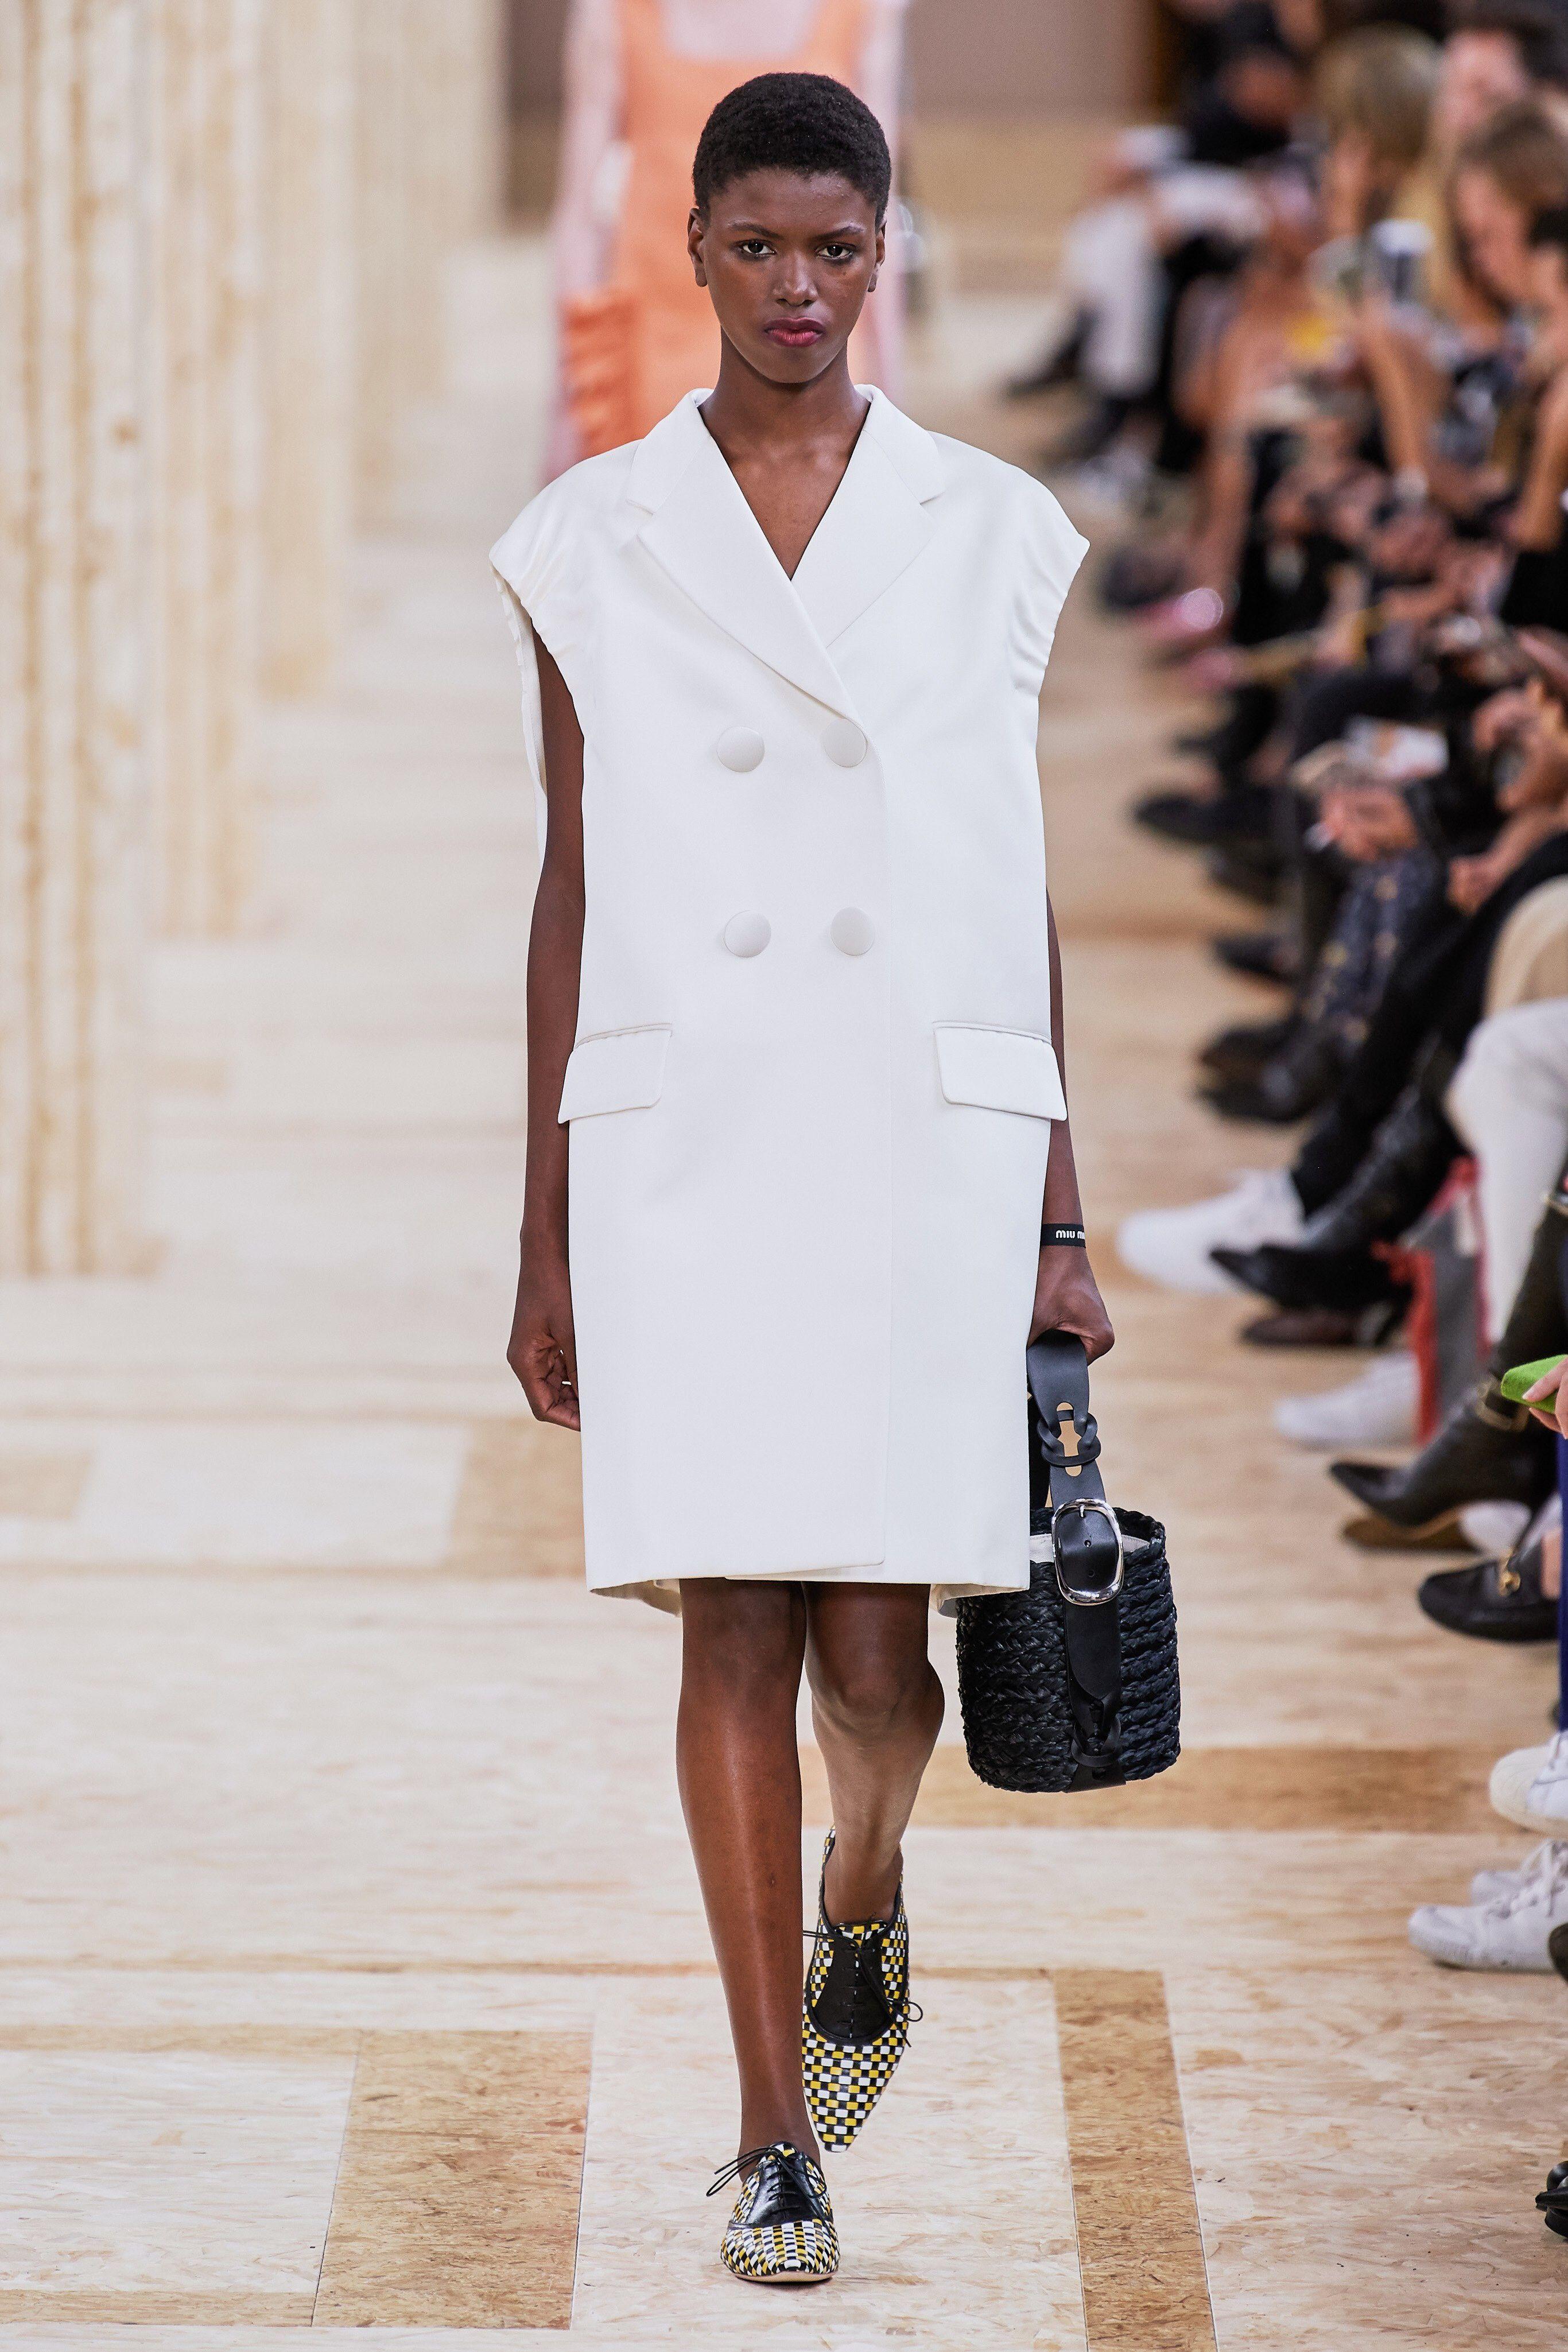 Miu Miu Spring Ready to Wear 2020 Collection | Shopping, Miu